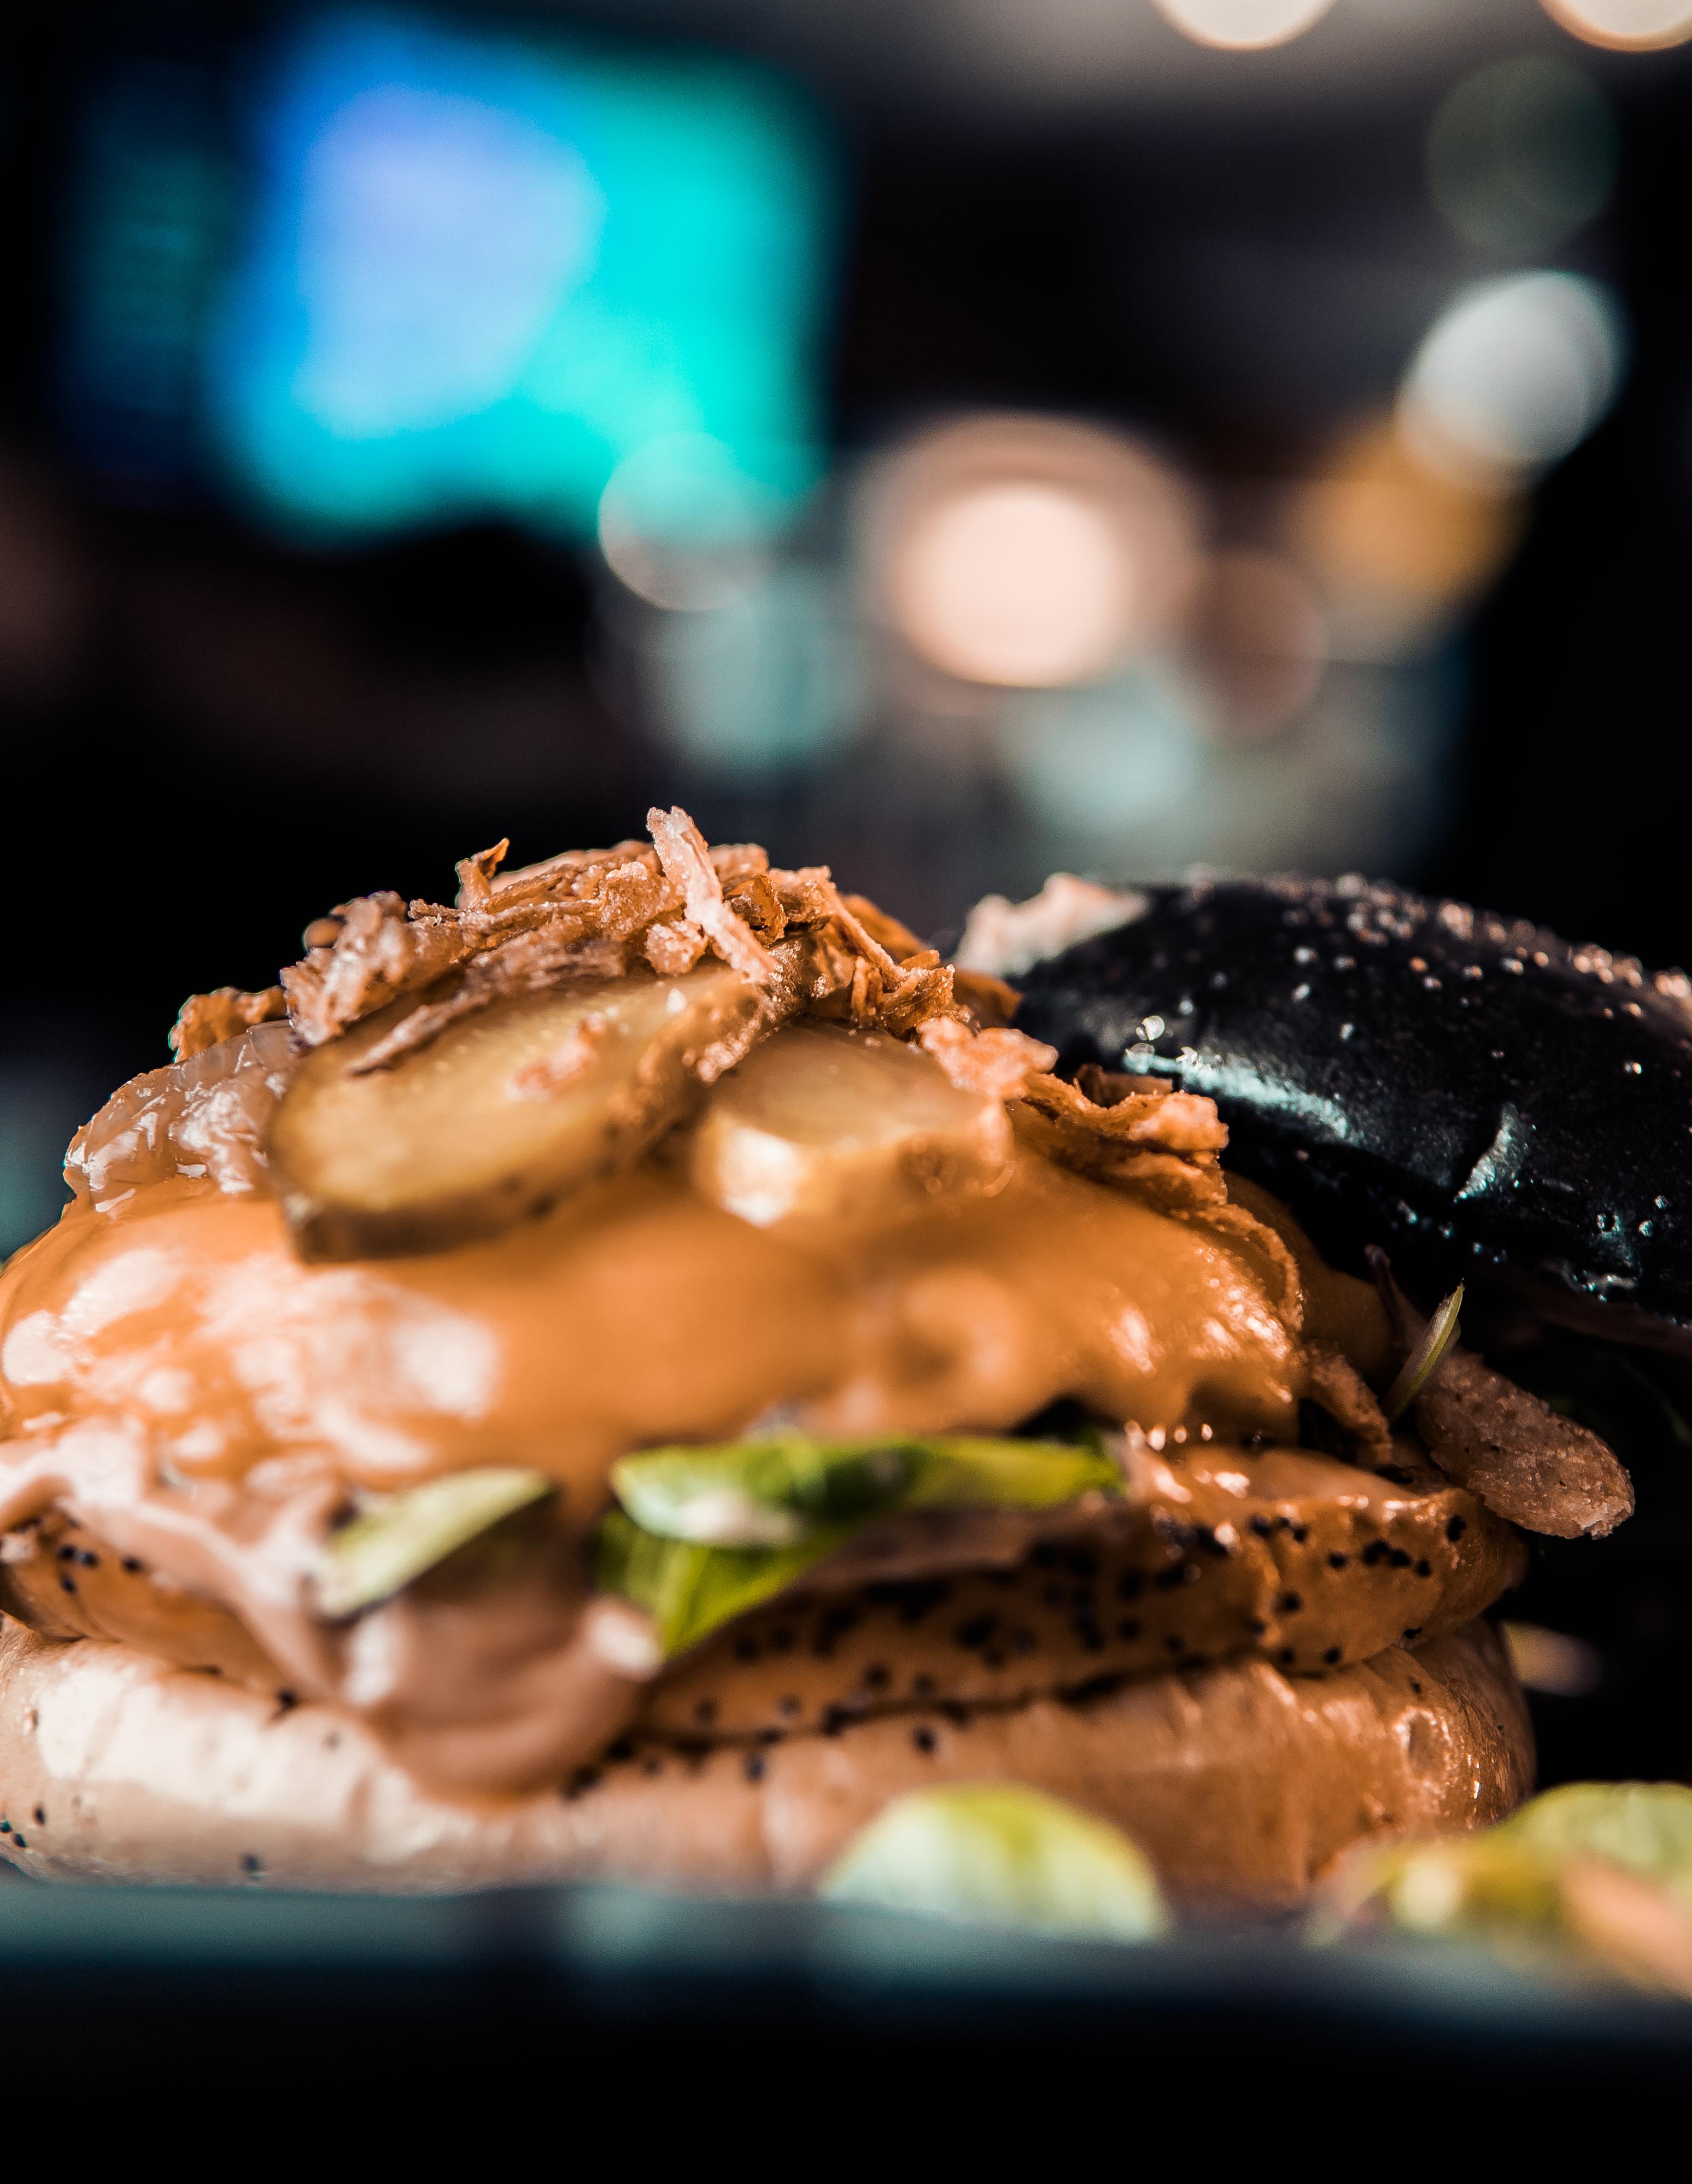 Black and White Burger